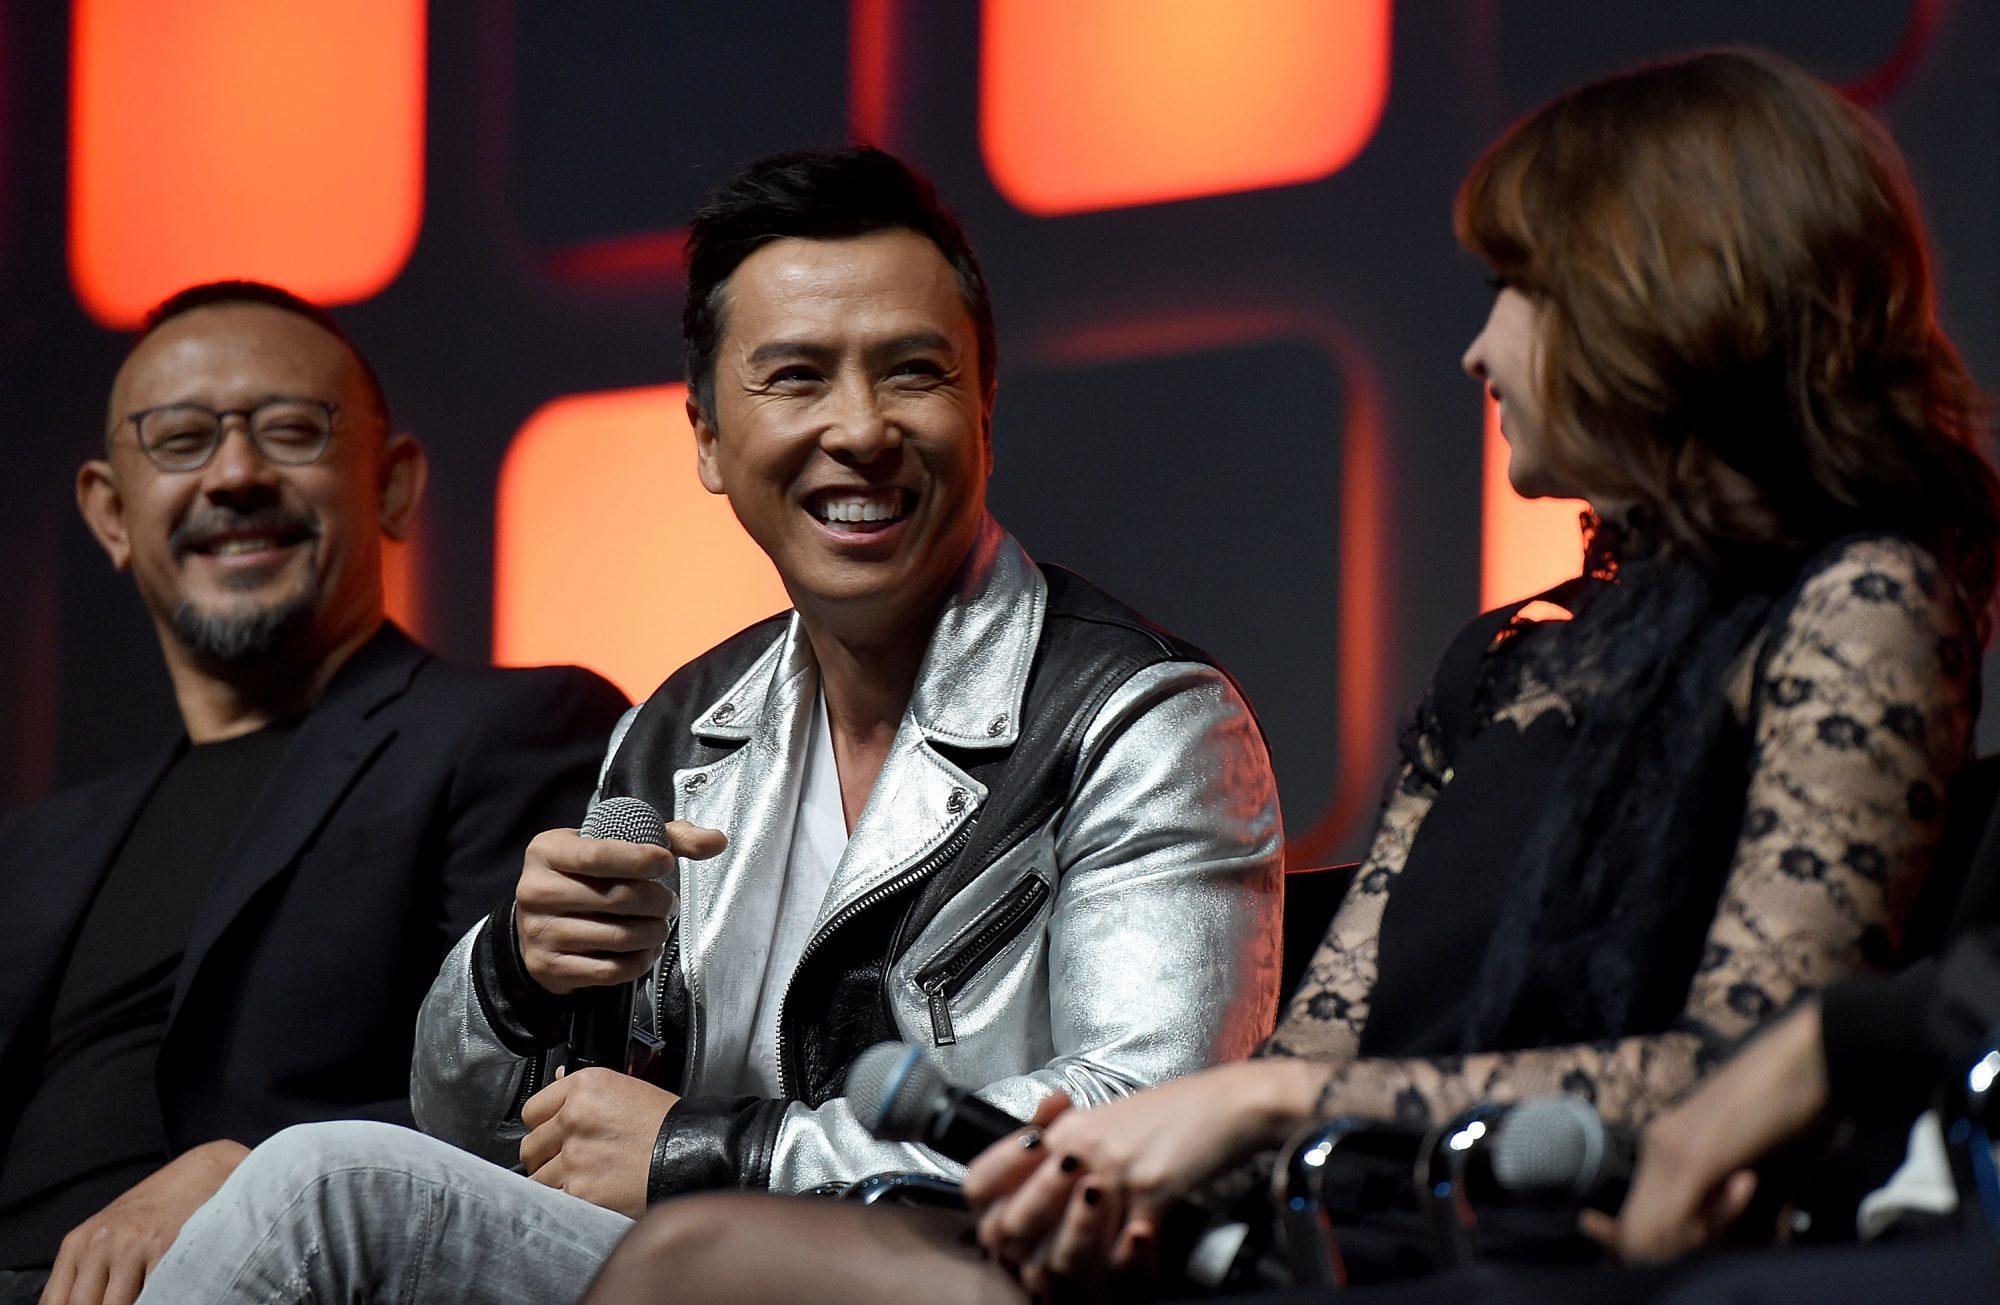 L-R: Jiang Wen, Donnie Yen, and Felicity Jones